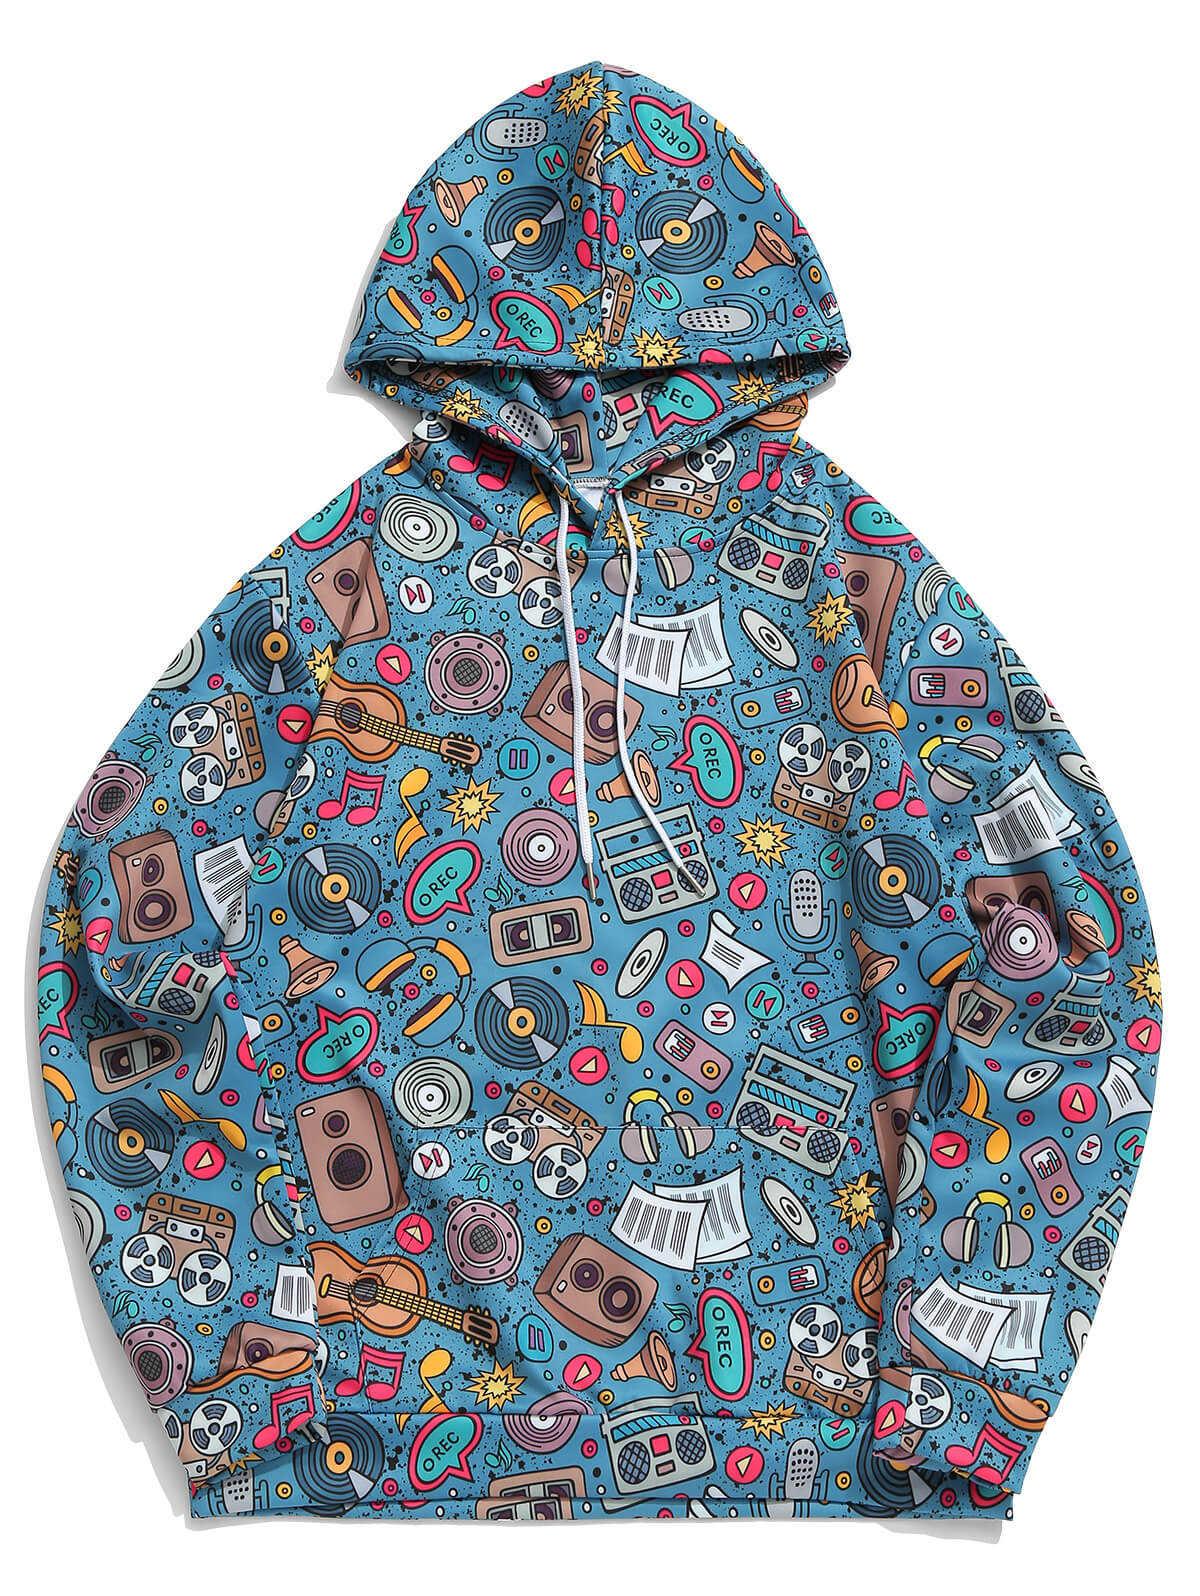 ZAFUL 남자 음악 요소 그래픽 프린트 캐주얼 까마귀 긴 소매 캥거루 포켓 탑스 캐주얼 힙합 웃긴 Streetwear 스웨트